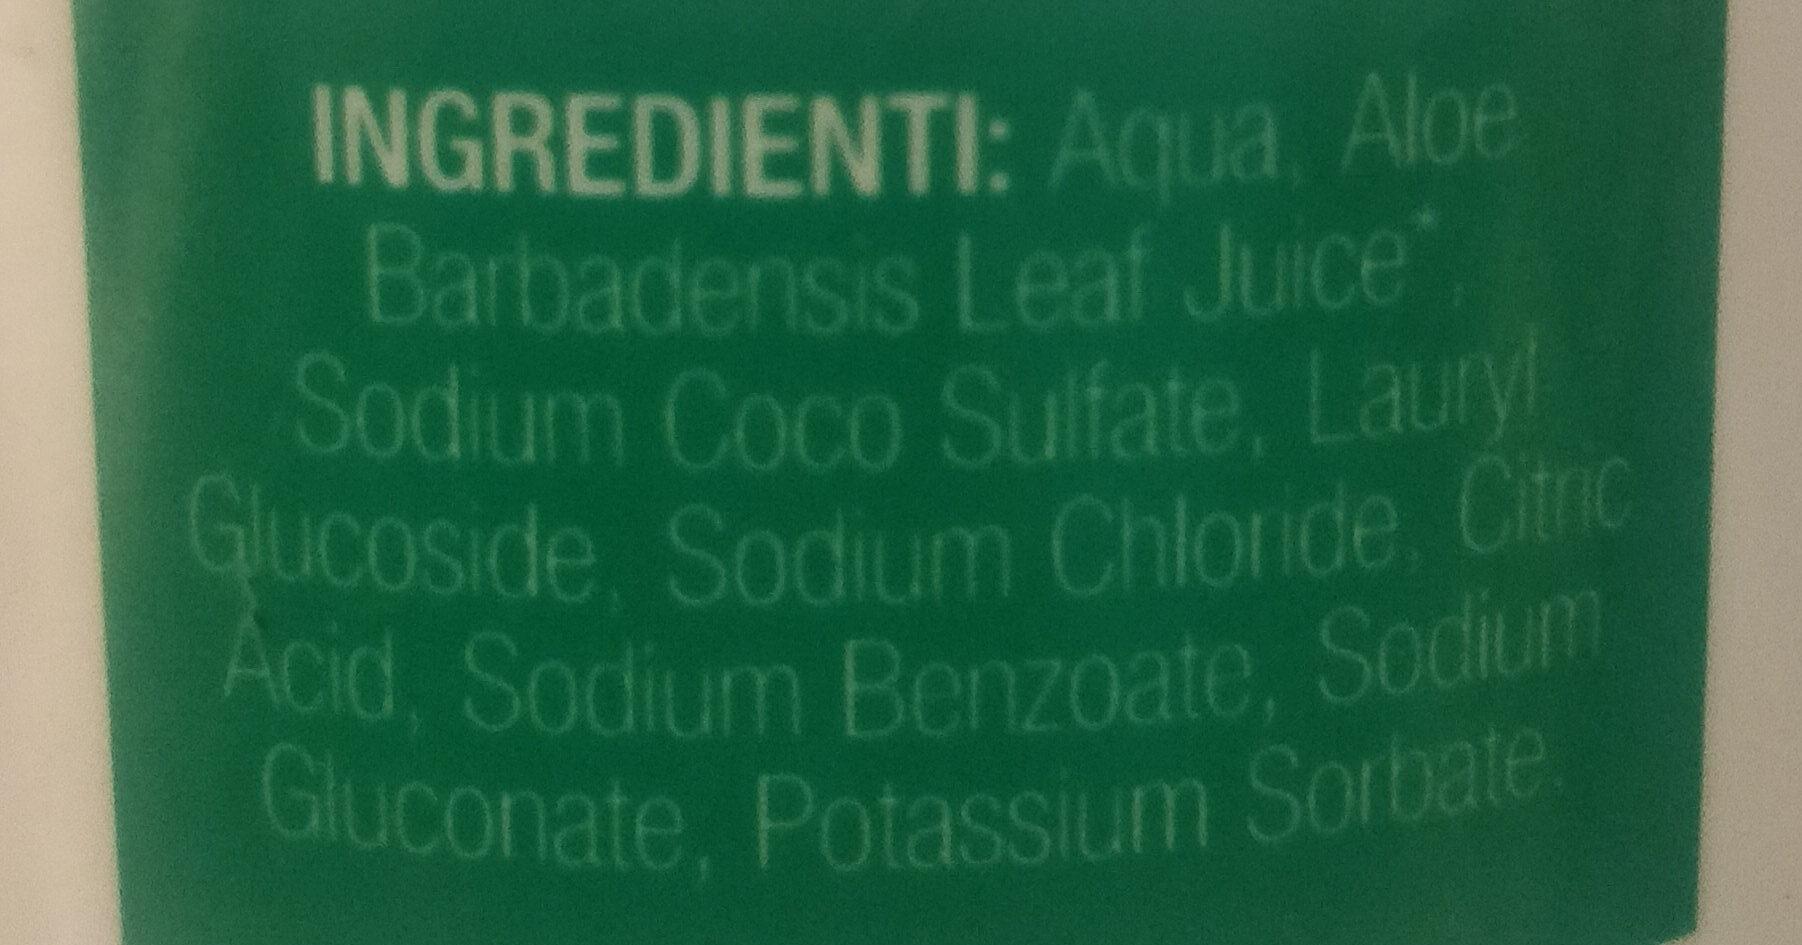 sapone mani bio all'aloe vera - Ingredients - it